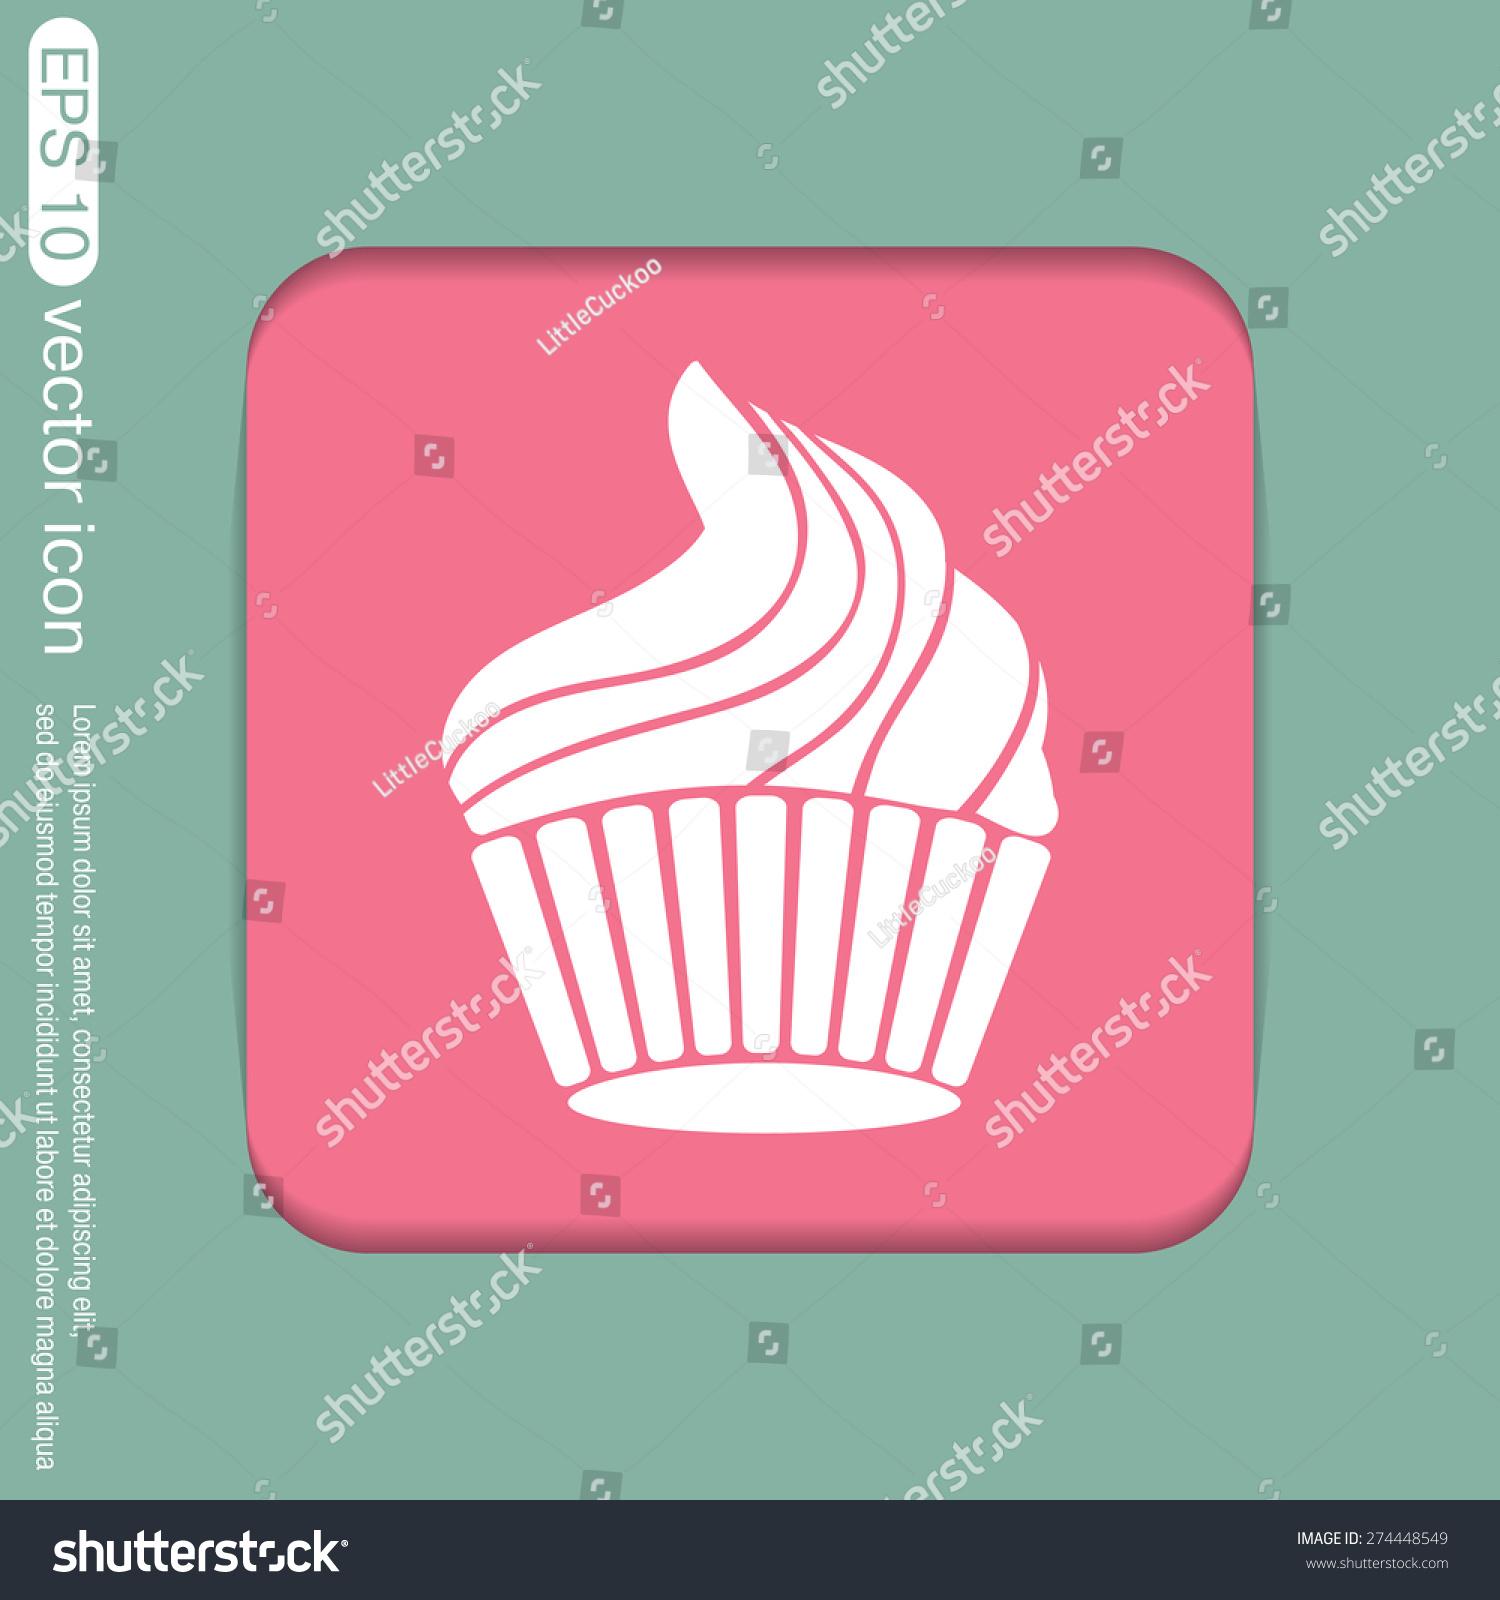 Birthday cake icon symbol cake celebrating stock vector 274448549 birthday cake icon symbol of cake celebrating the birthday of the loaf biocorpaavc